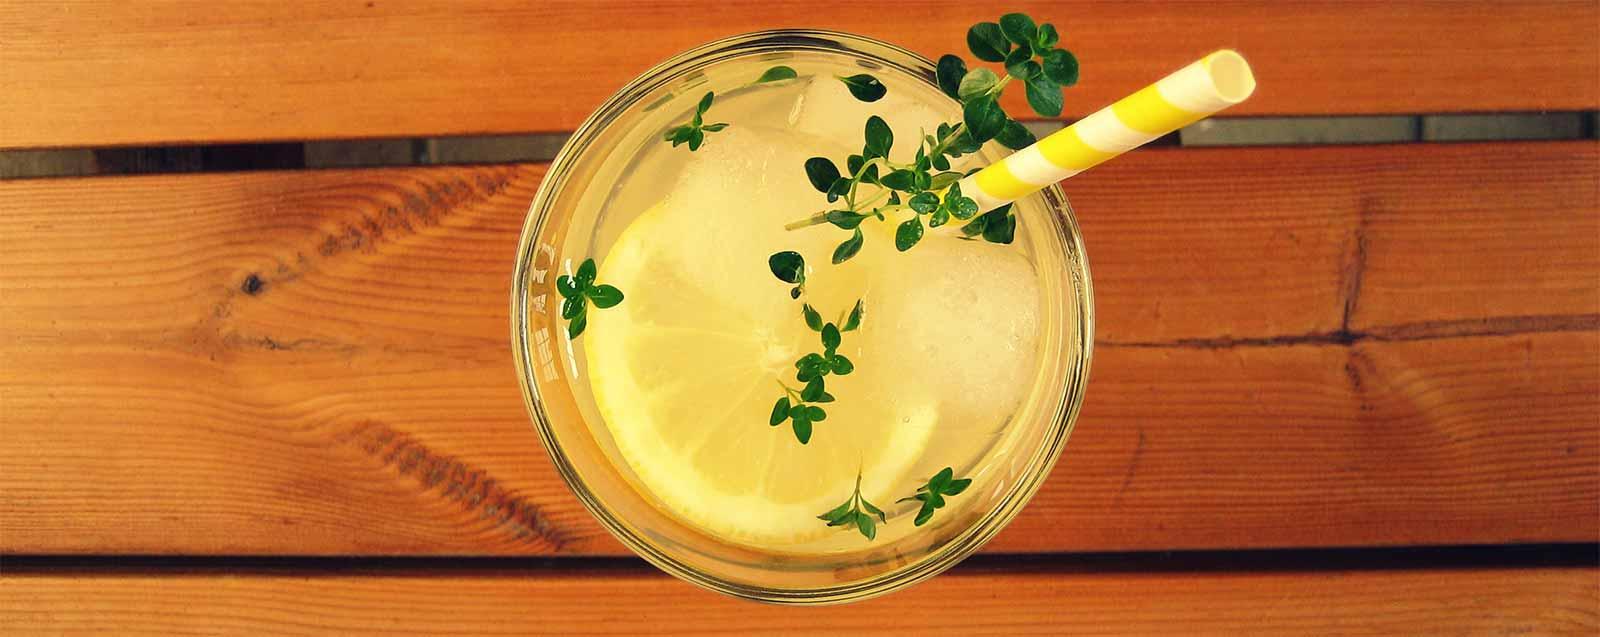 den-sommer-geniessen-rezept-fuer-thymian-limonade